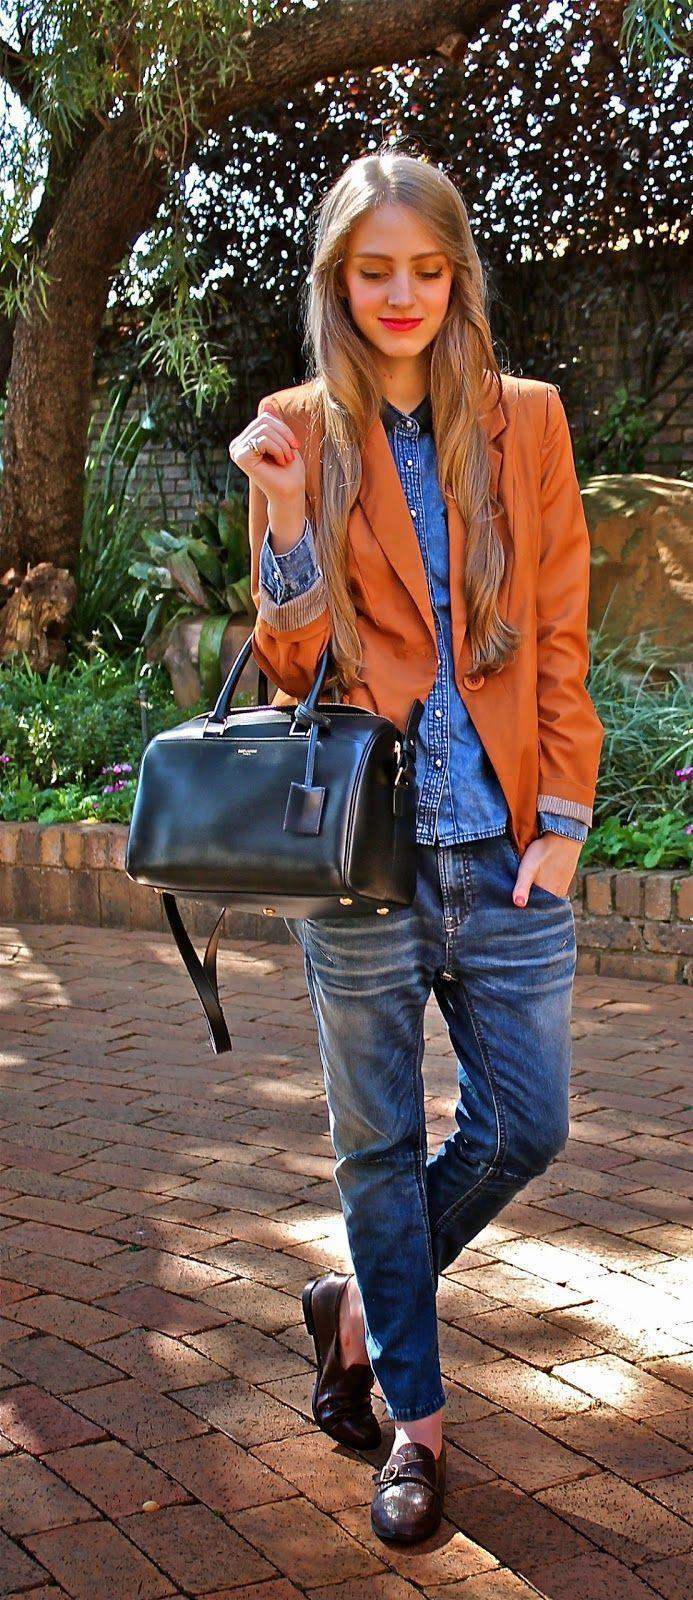 "Foto: Reprodução / <a href=""http://fashionable-passion.blogspot.com.br/2014/06/boyish-browns.html"" target=""_blank"">Fashionable Passion</a>"